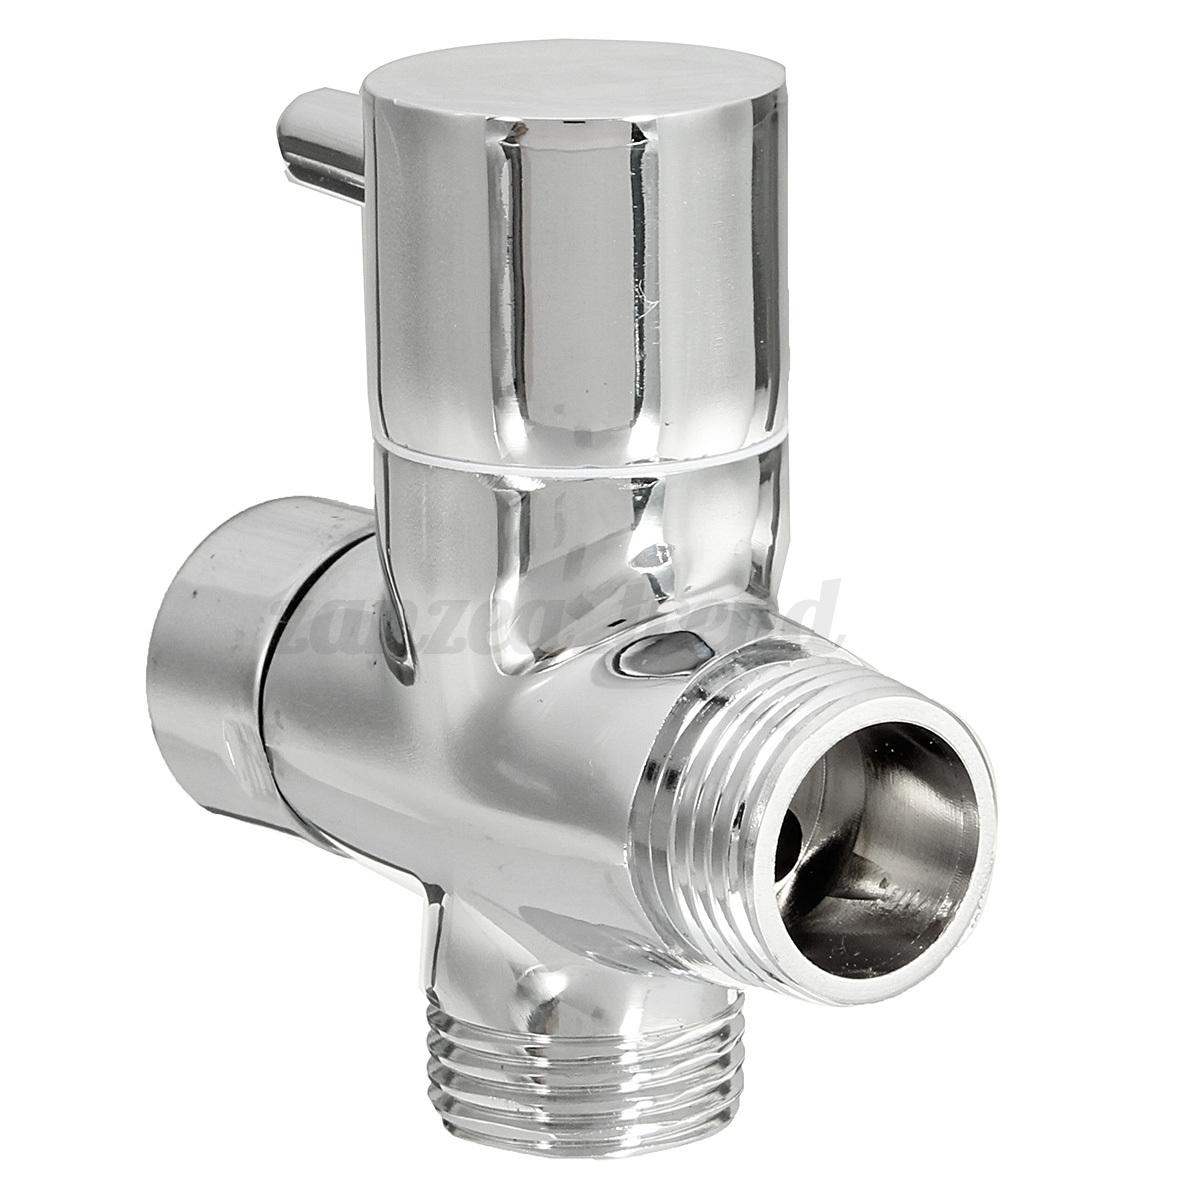 G1 2 3 Way Brass T Adapter Diverter Valve For Bidet Sprayer Tap Shower Diagram Velo Thermostatic Detail Image